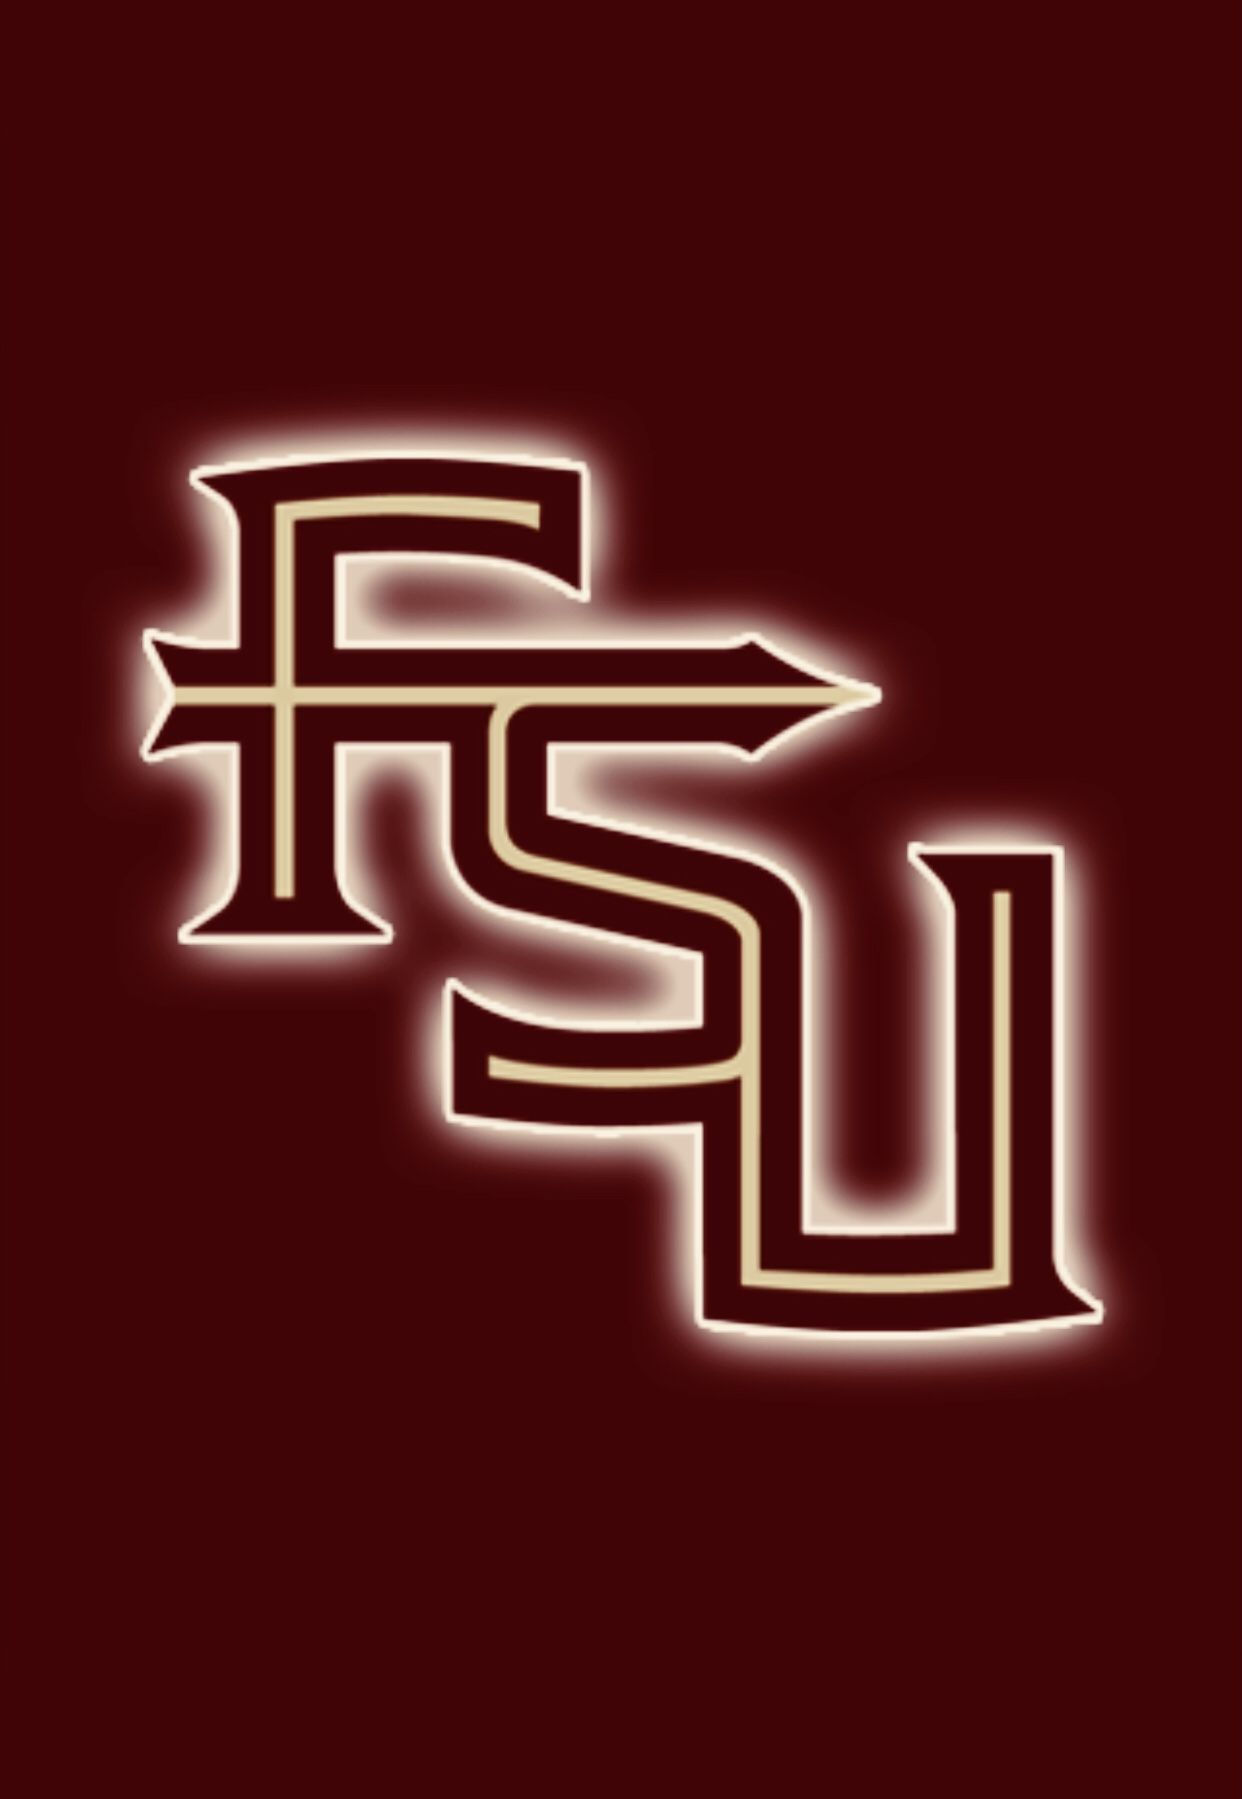 Pin By Leon Buxton On Noles Fsu Seminoles Football Florida State Seminoles Fsu Logo